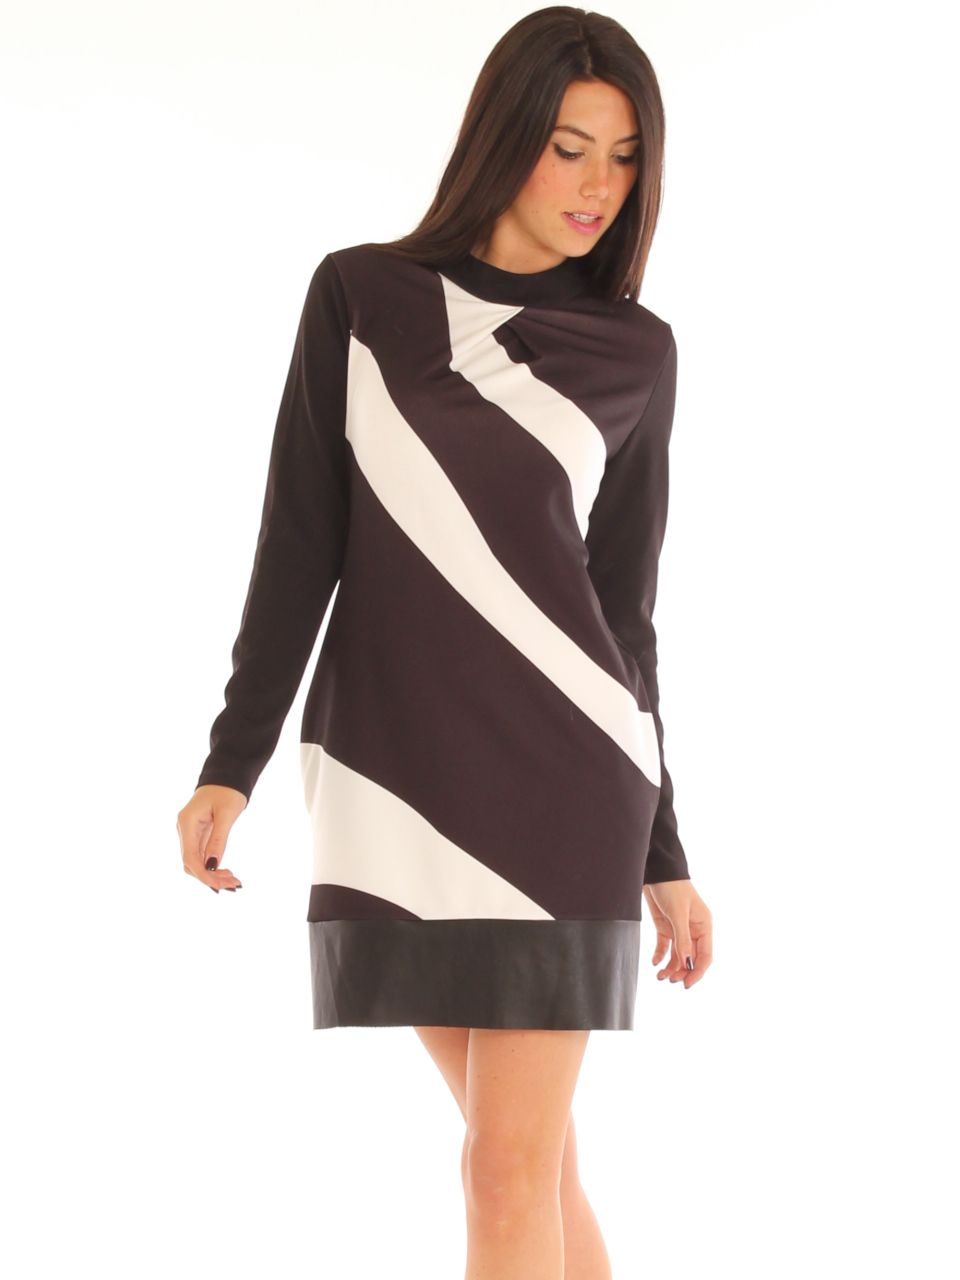 Black and white patterned stretch jersey elegant short evening dress